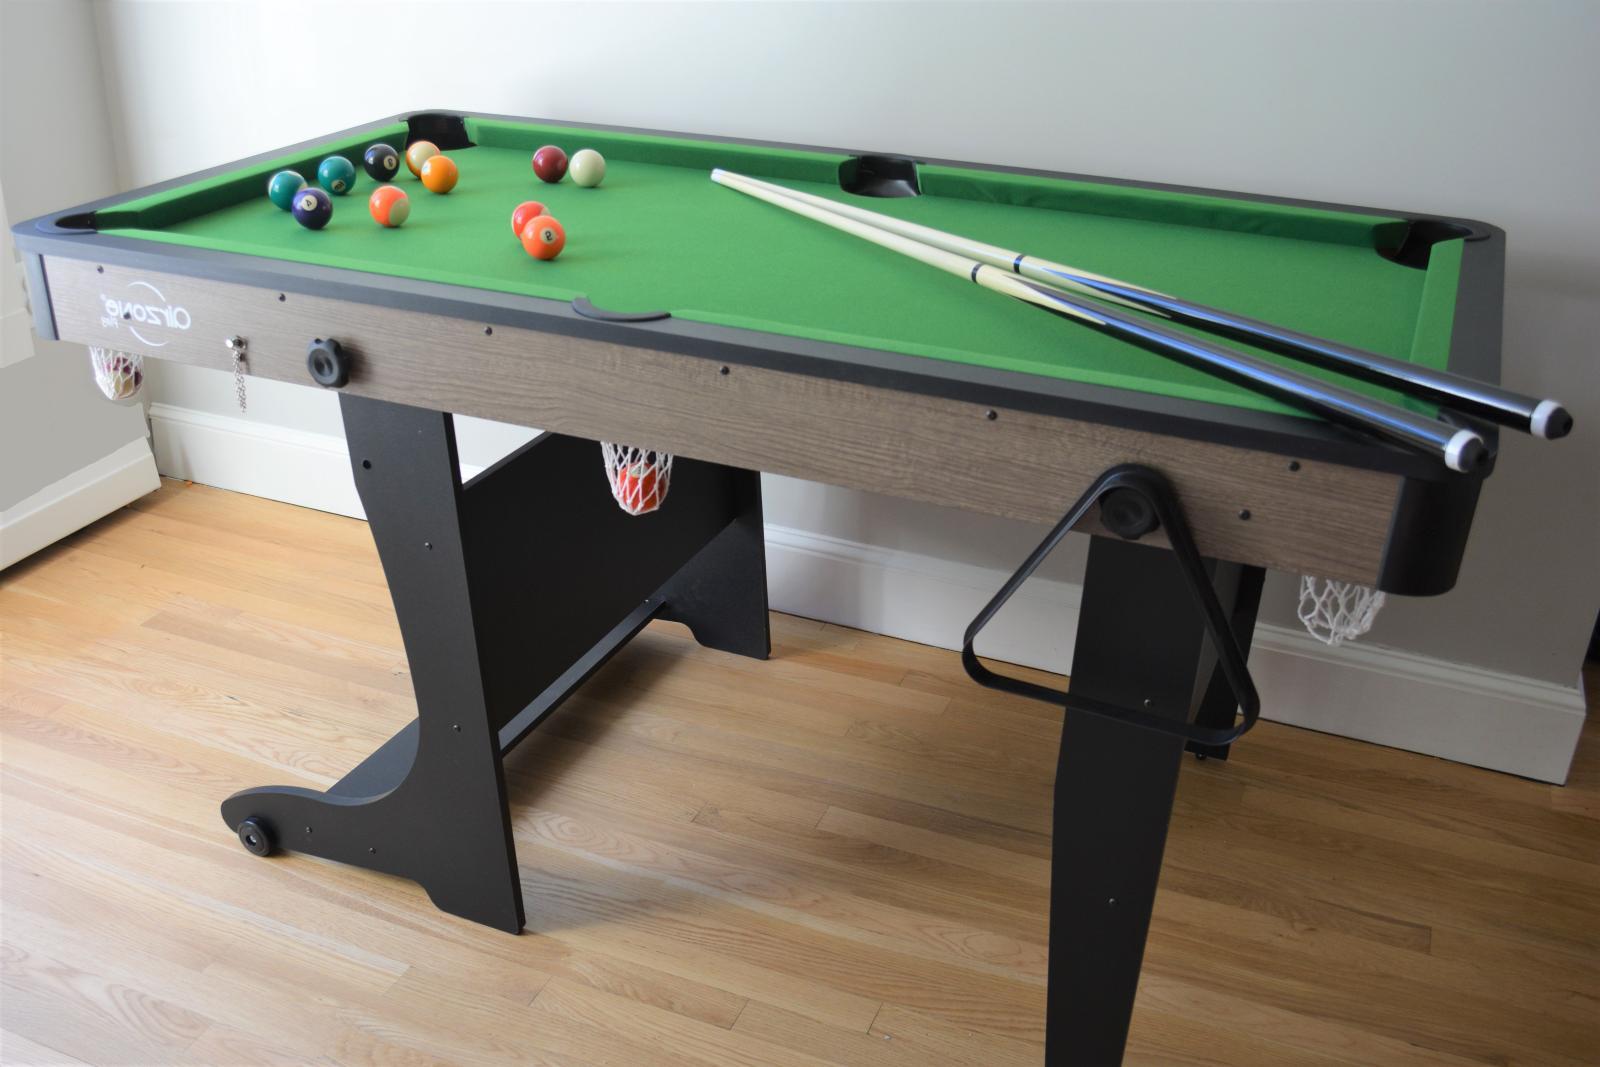 5' Folding Billiard Pool Table Cues Balls Home